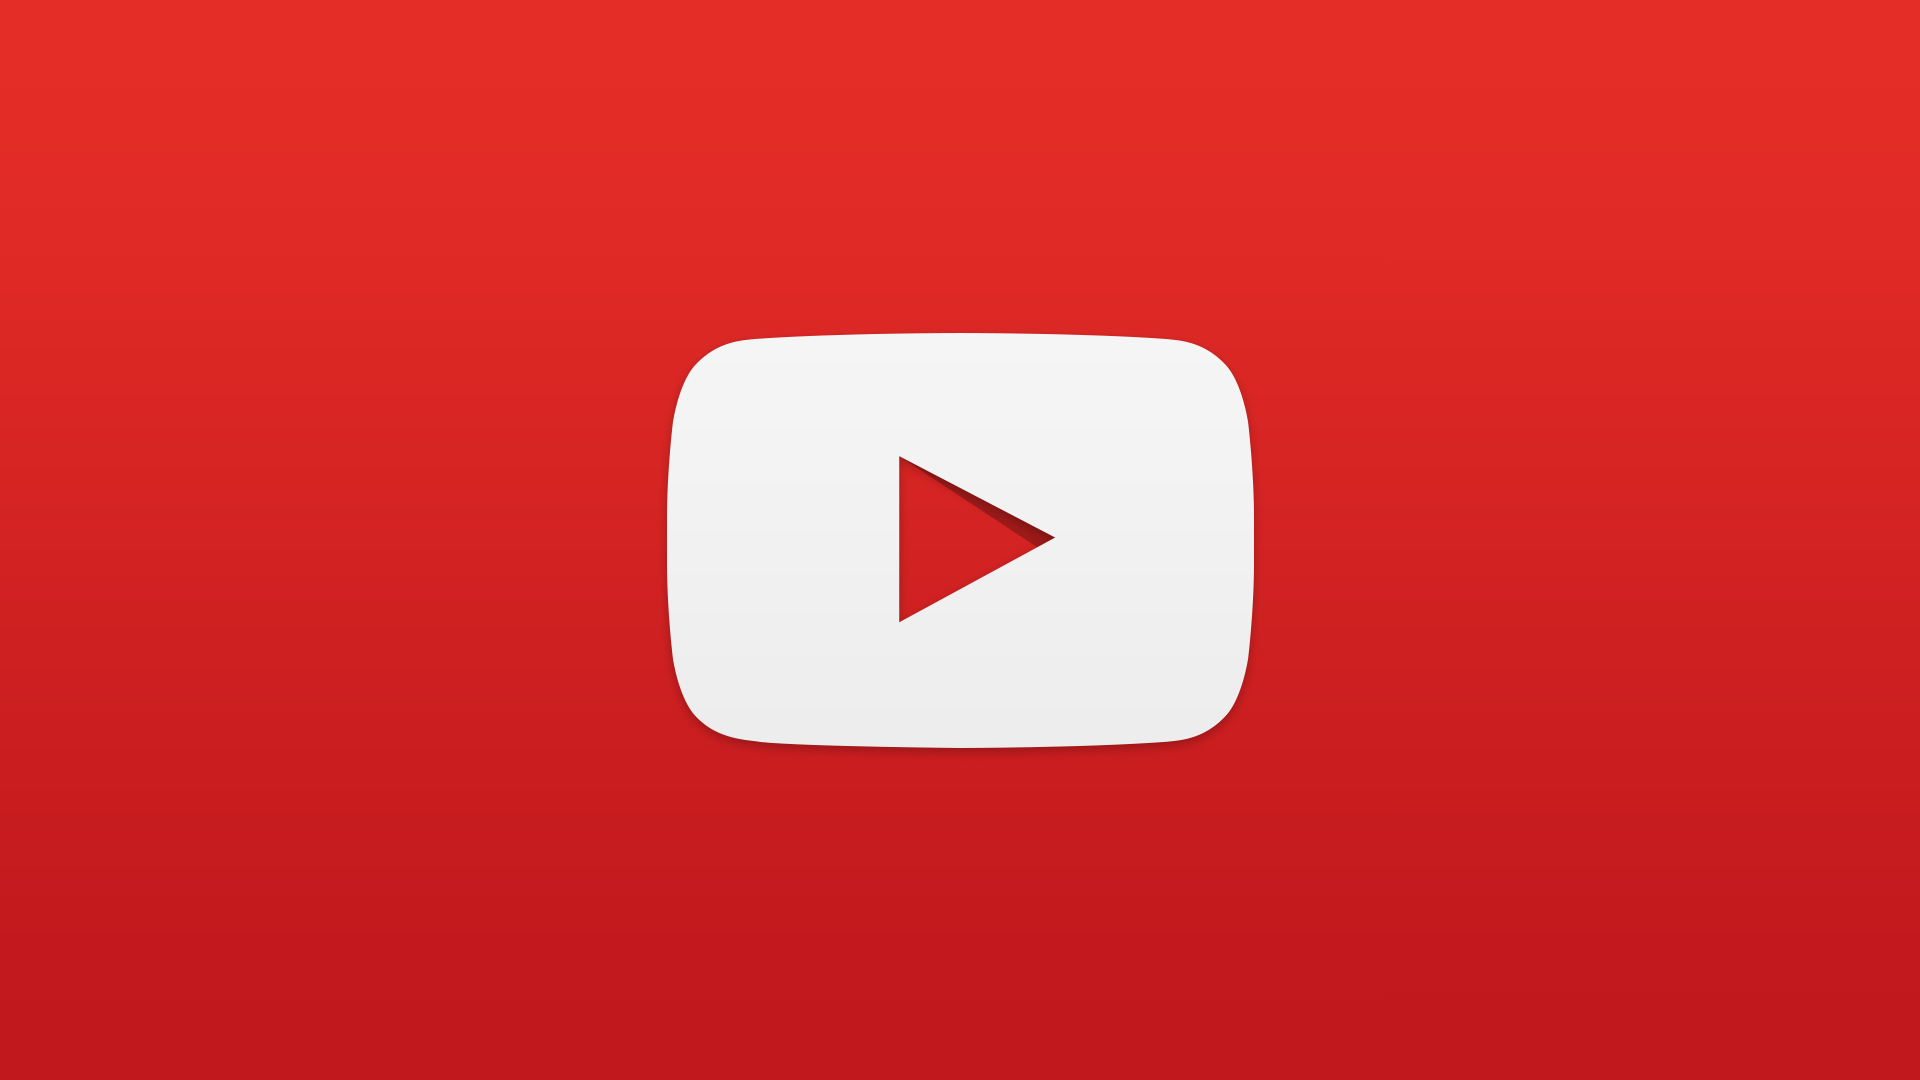 youtube-iphone-app-logo